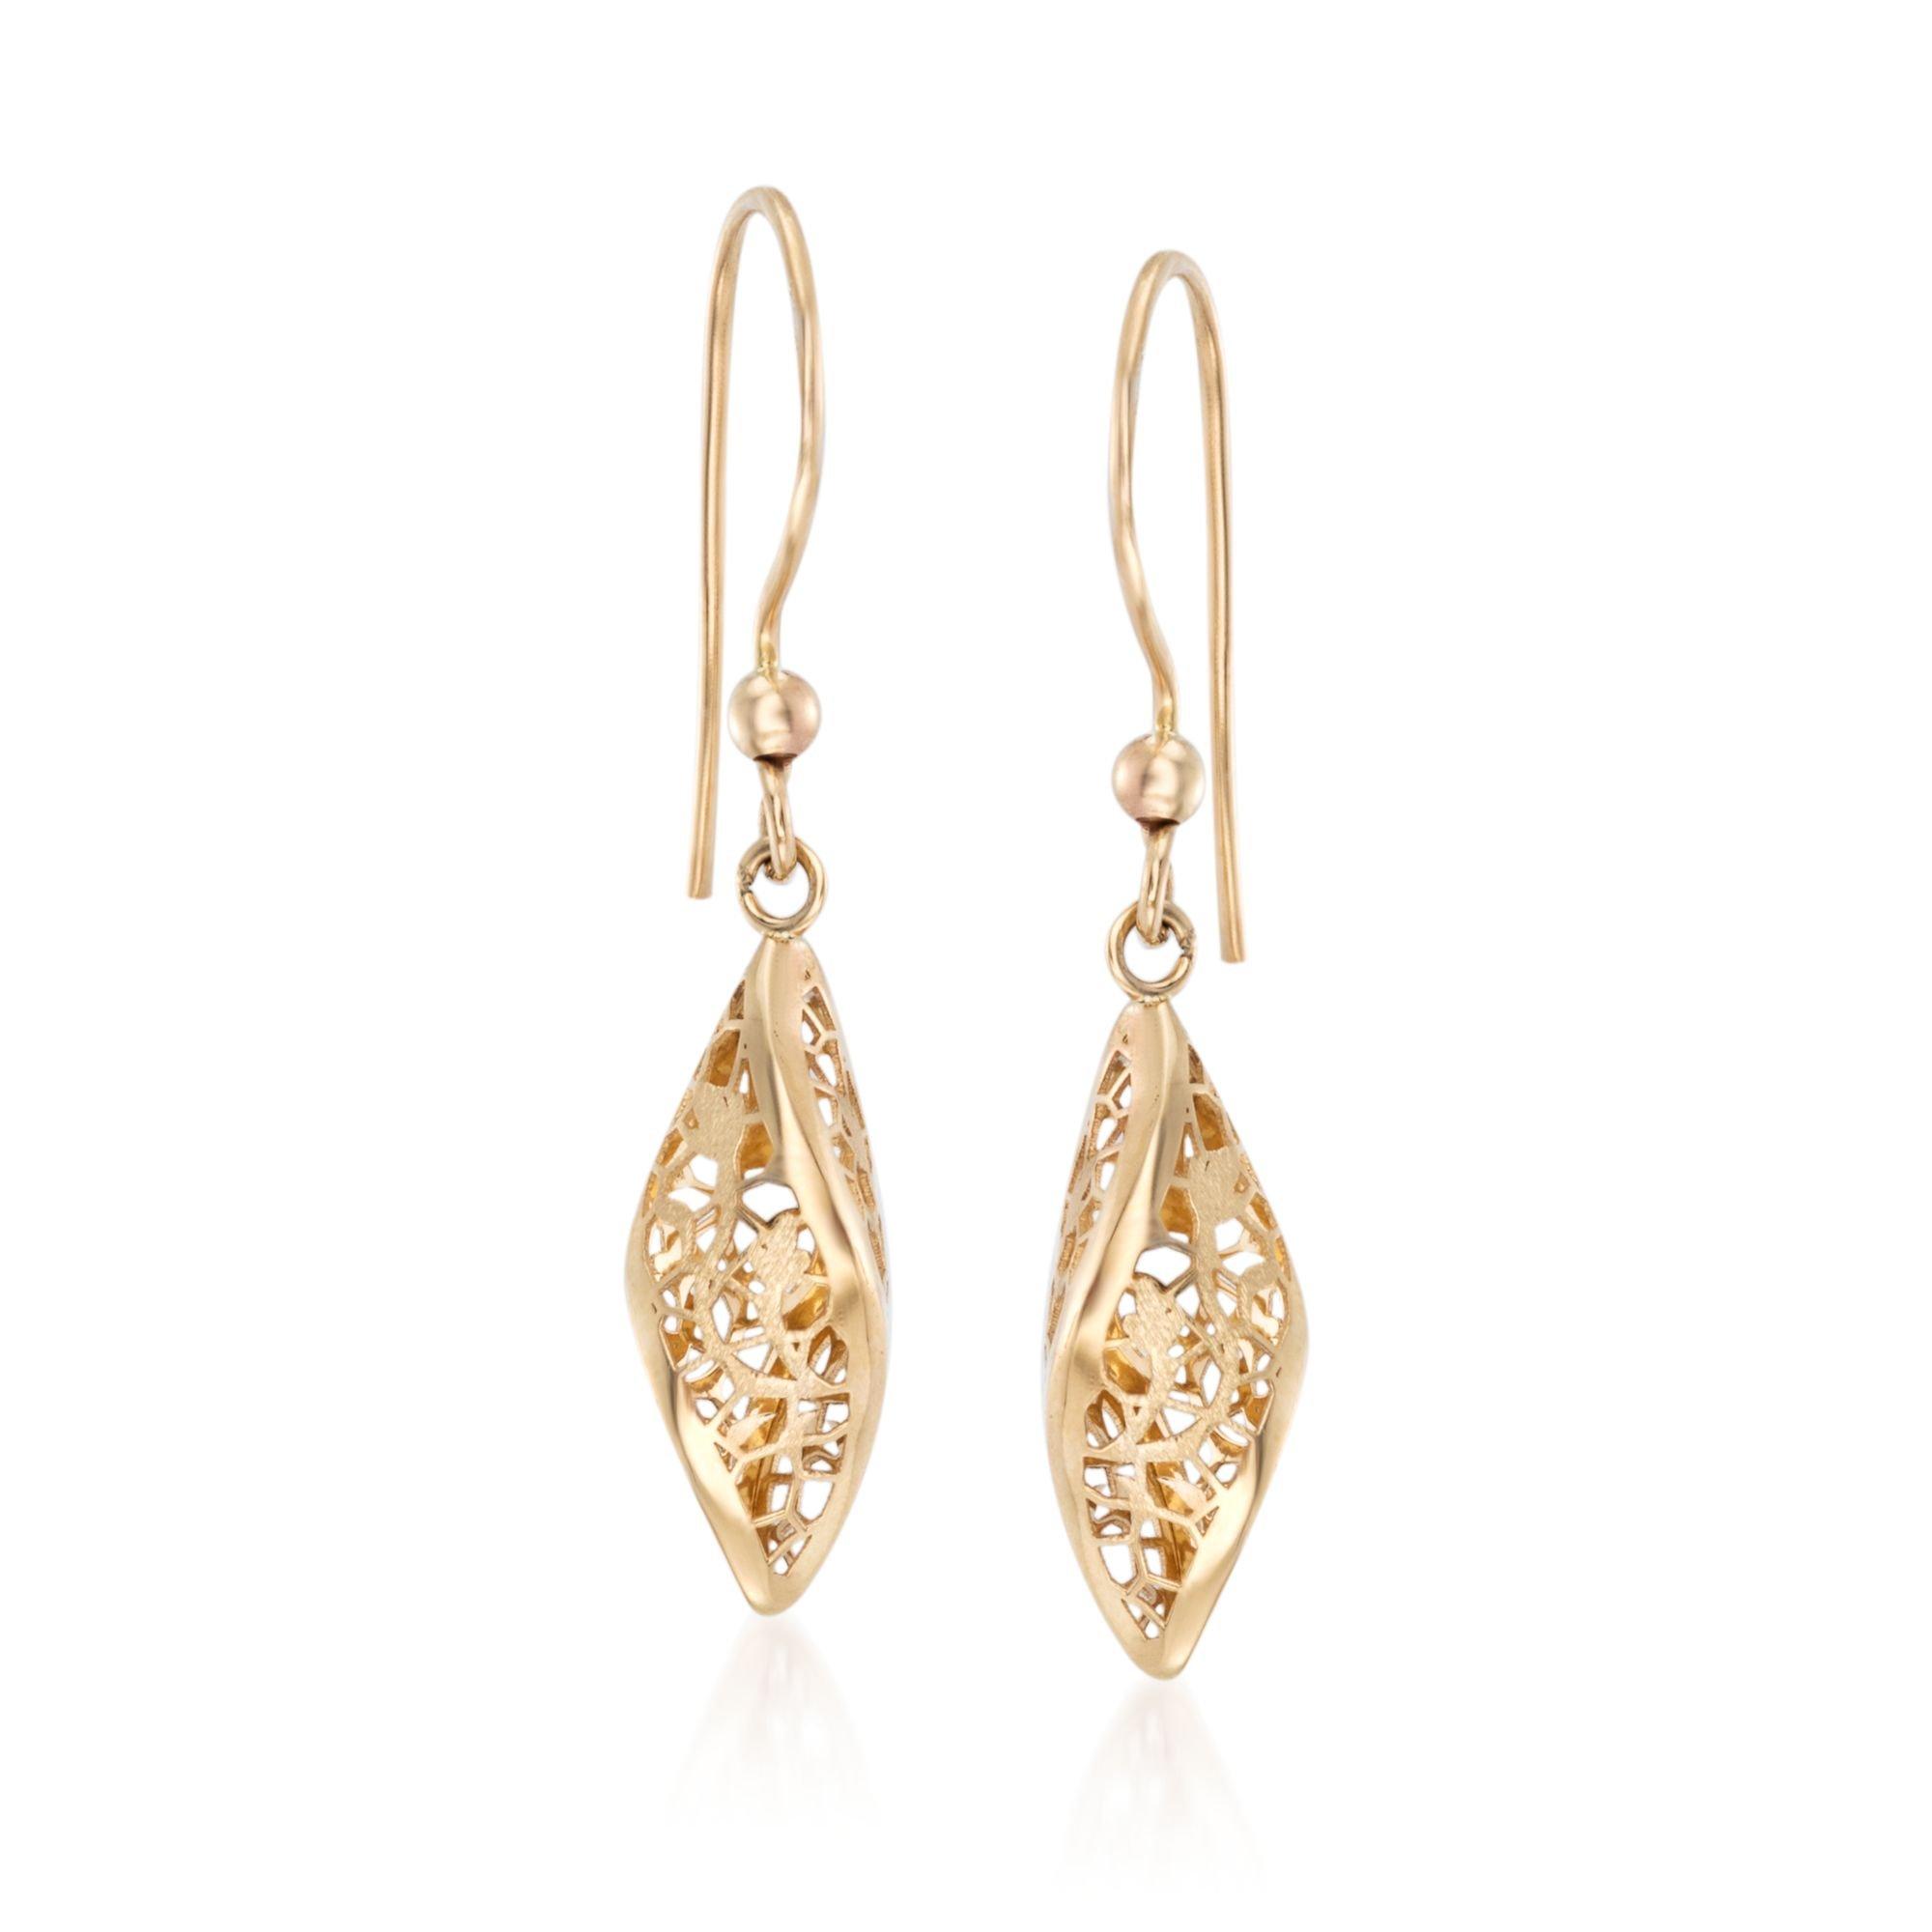 Ross-Simons Italian 14kt Yellow Gold Twisted Lace Drop Earrings